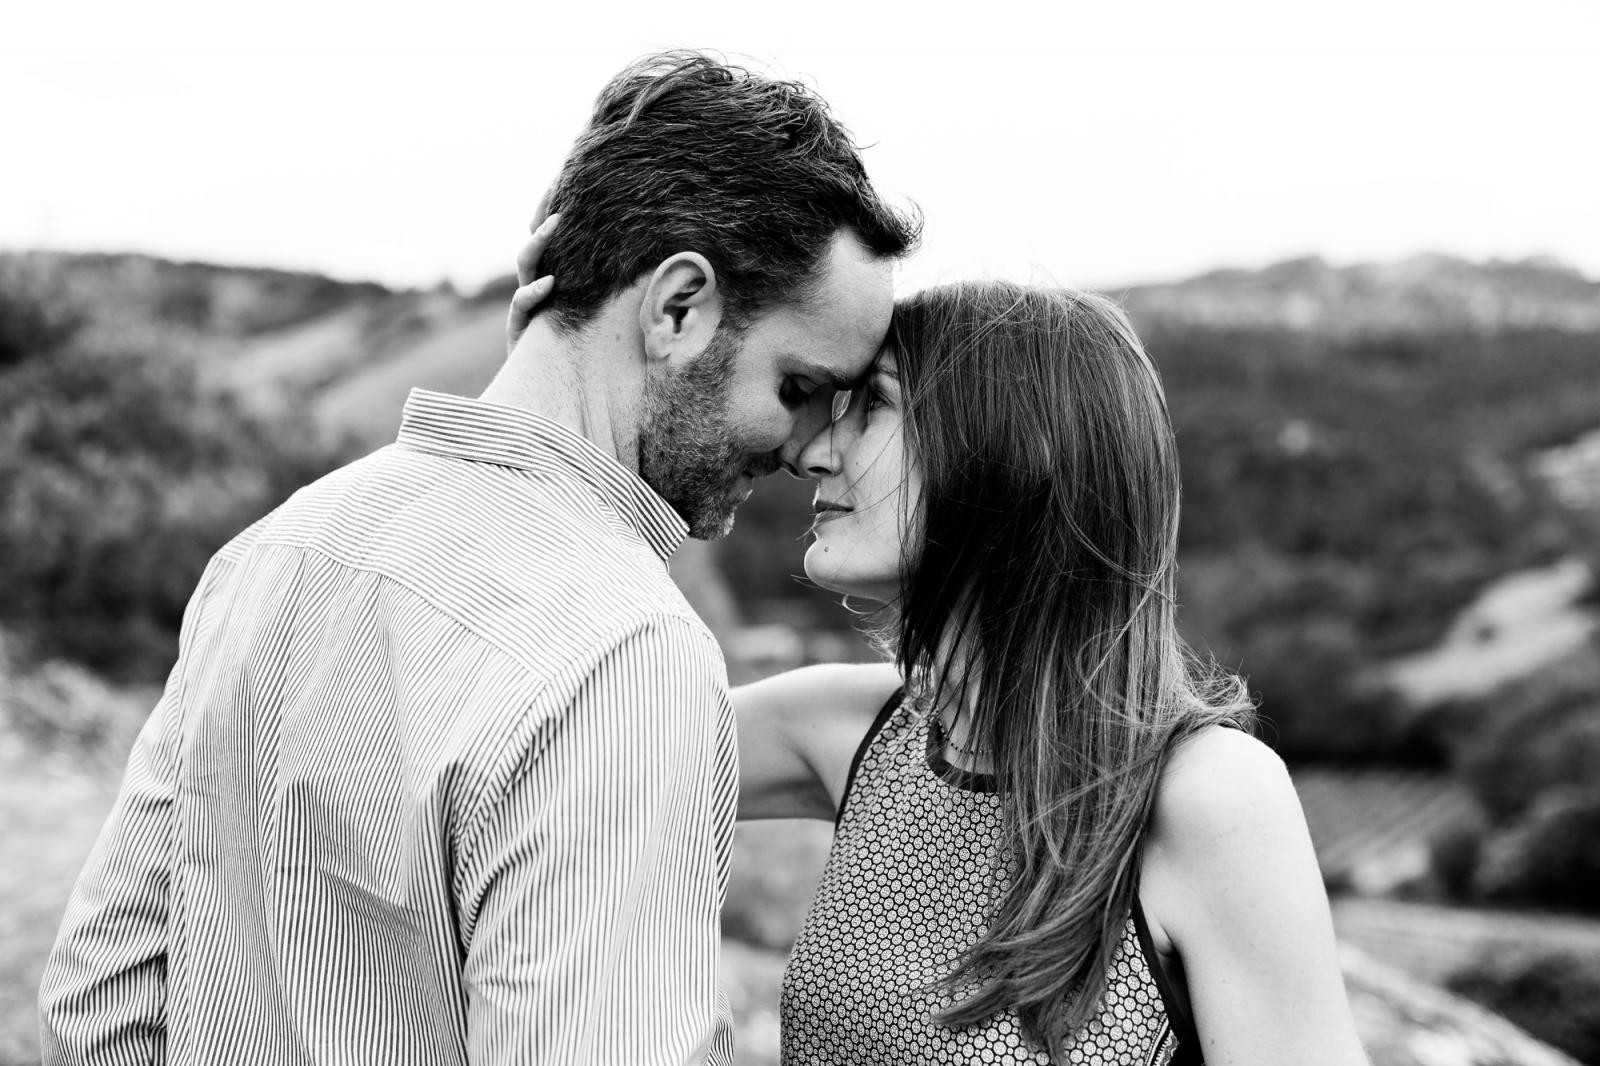 séance photo couple Avignon